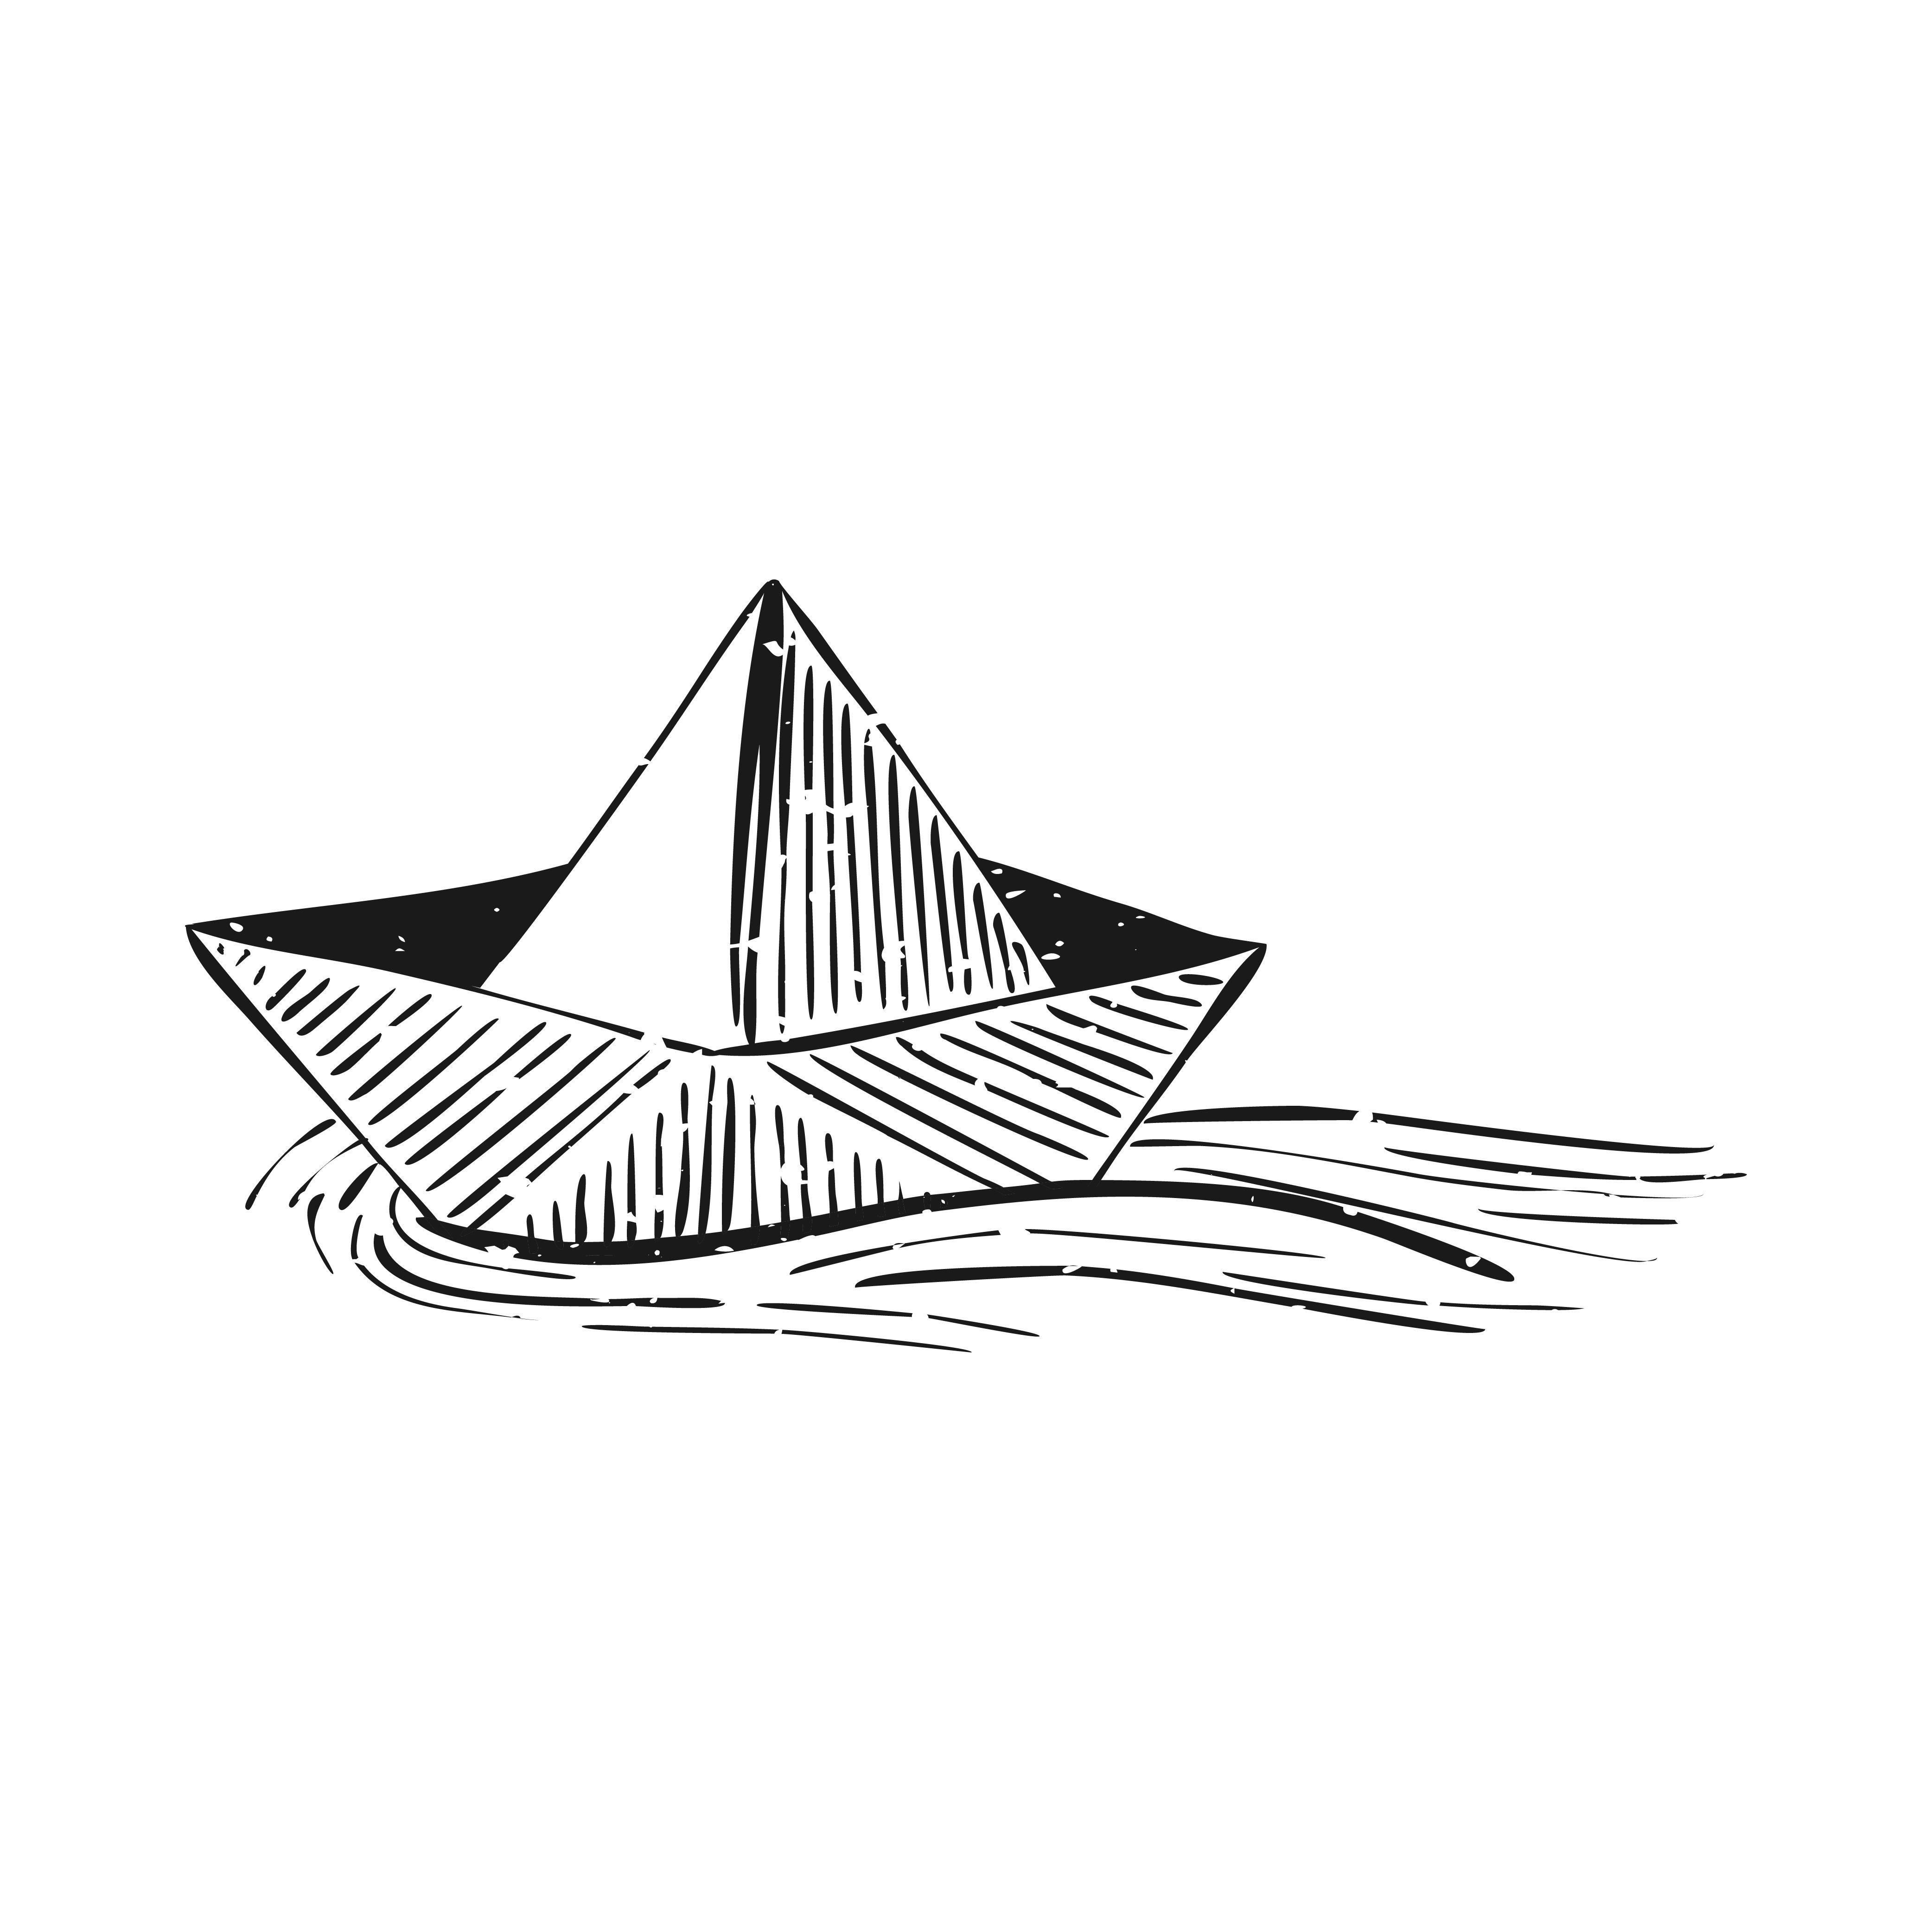 Pin De Daf Debasto En 笑傲江湖 Tatuaje De Barco Aviones De Papel Dibujo Libre De Vectores